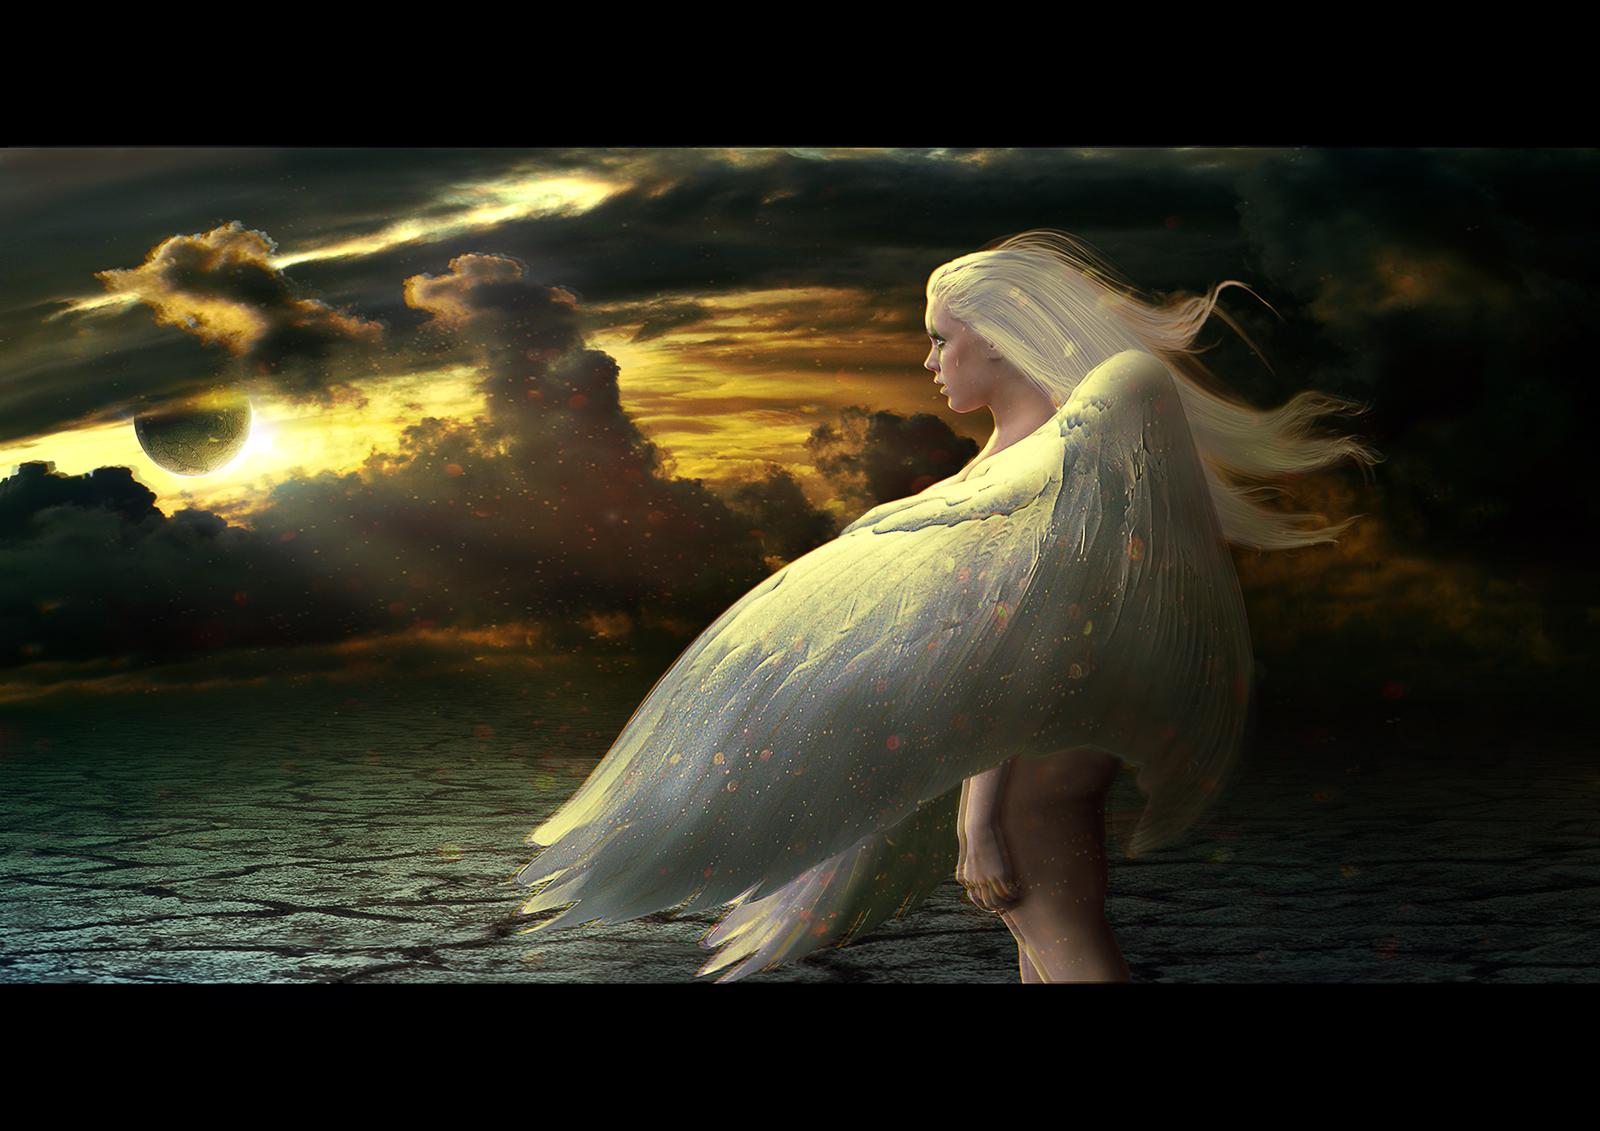 Ninth rebirth by DeeDeezz